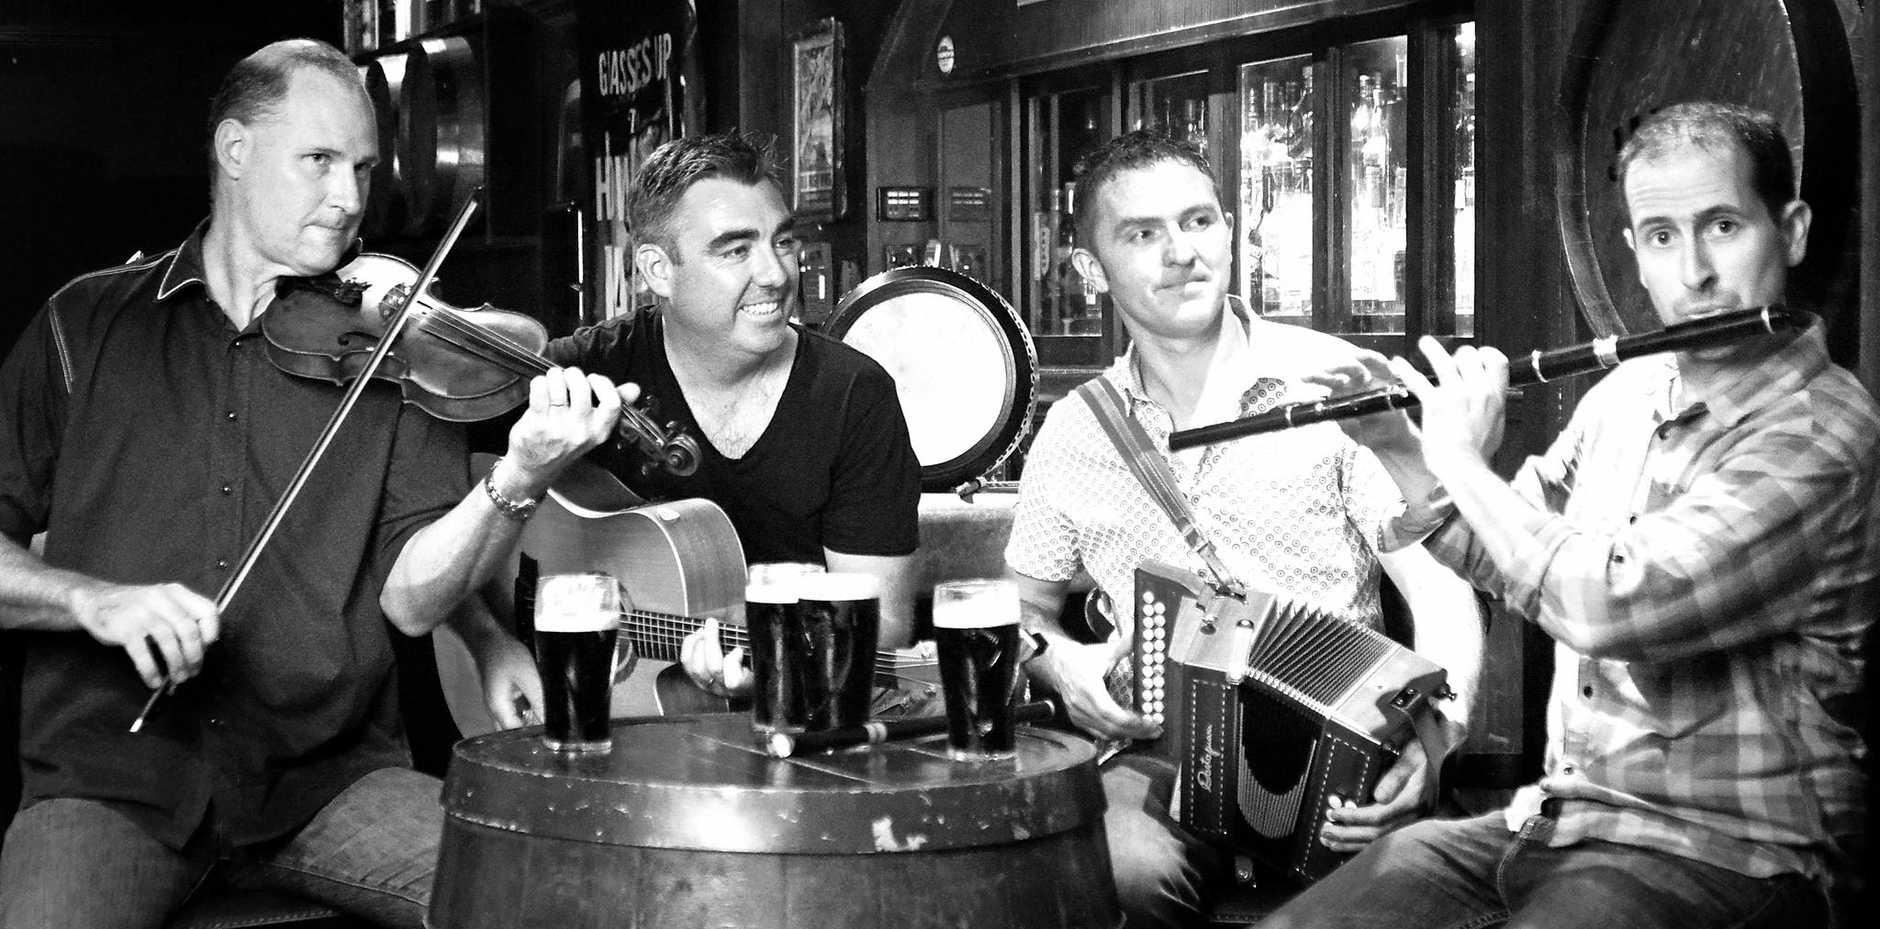 IRISH GIG: Brisbane-based Irish band Sásta, are providing the live music for the Heart of Ireland show in Caloundra.